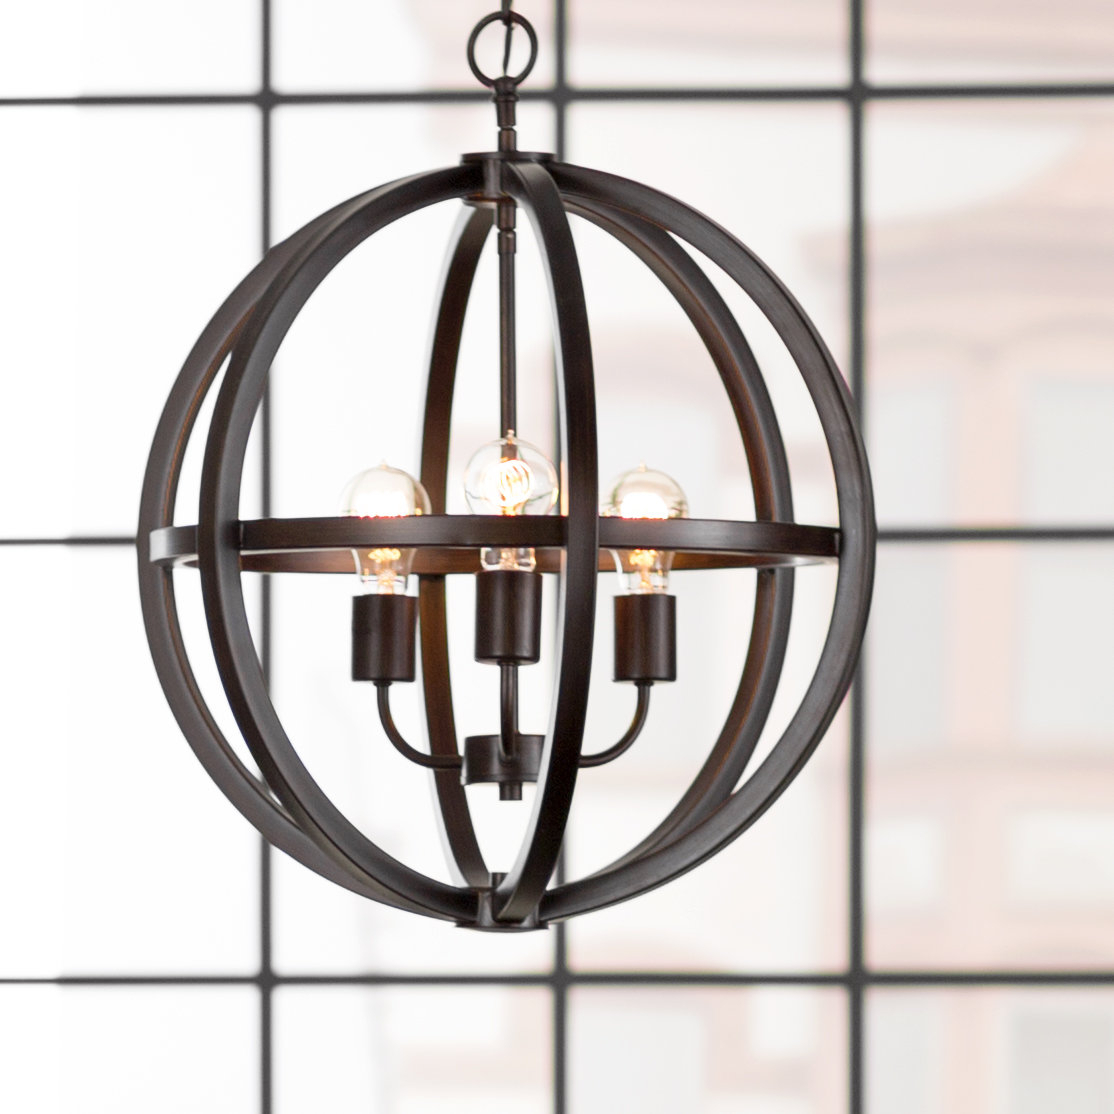 Irwin Globe Pendant With Regard To Irwin 1 Light Single Globe Pendants (View 16 of 30)